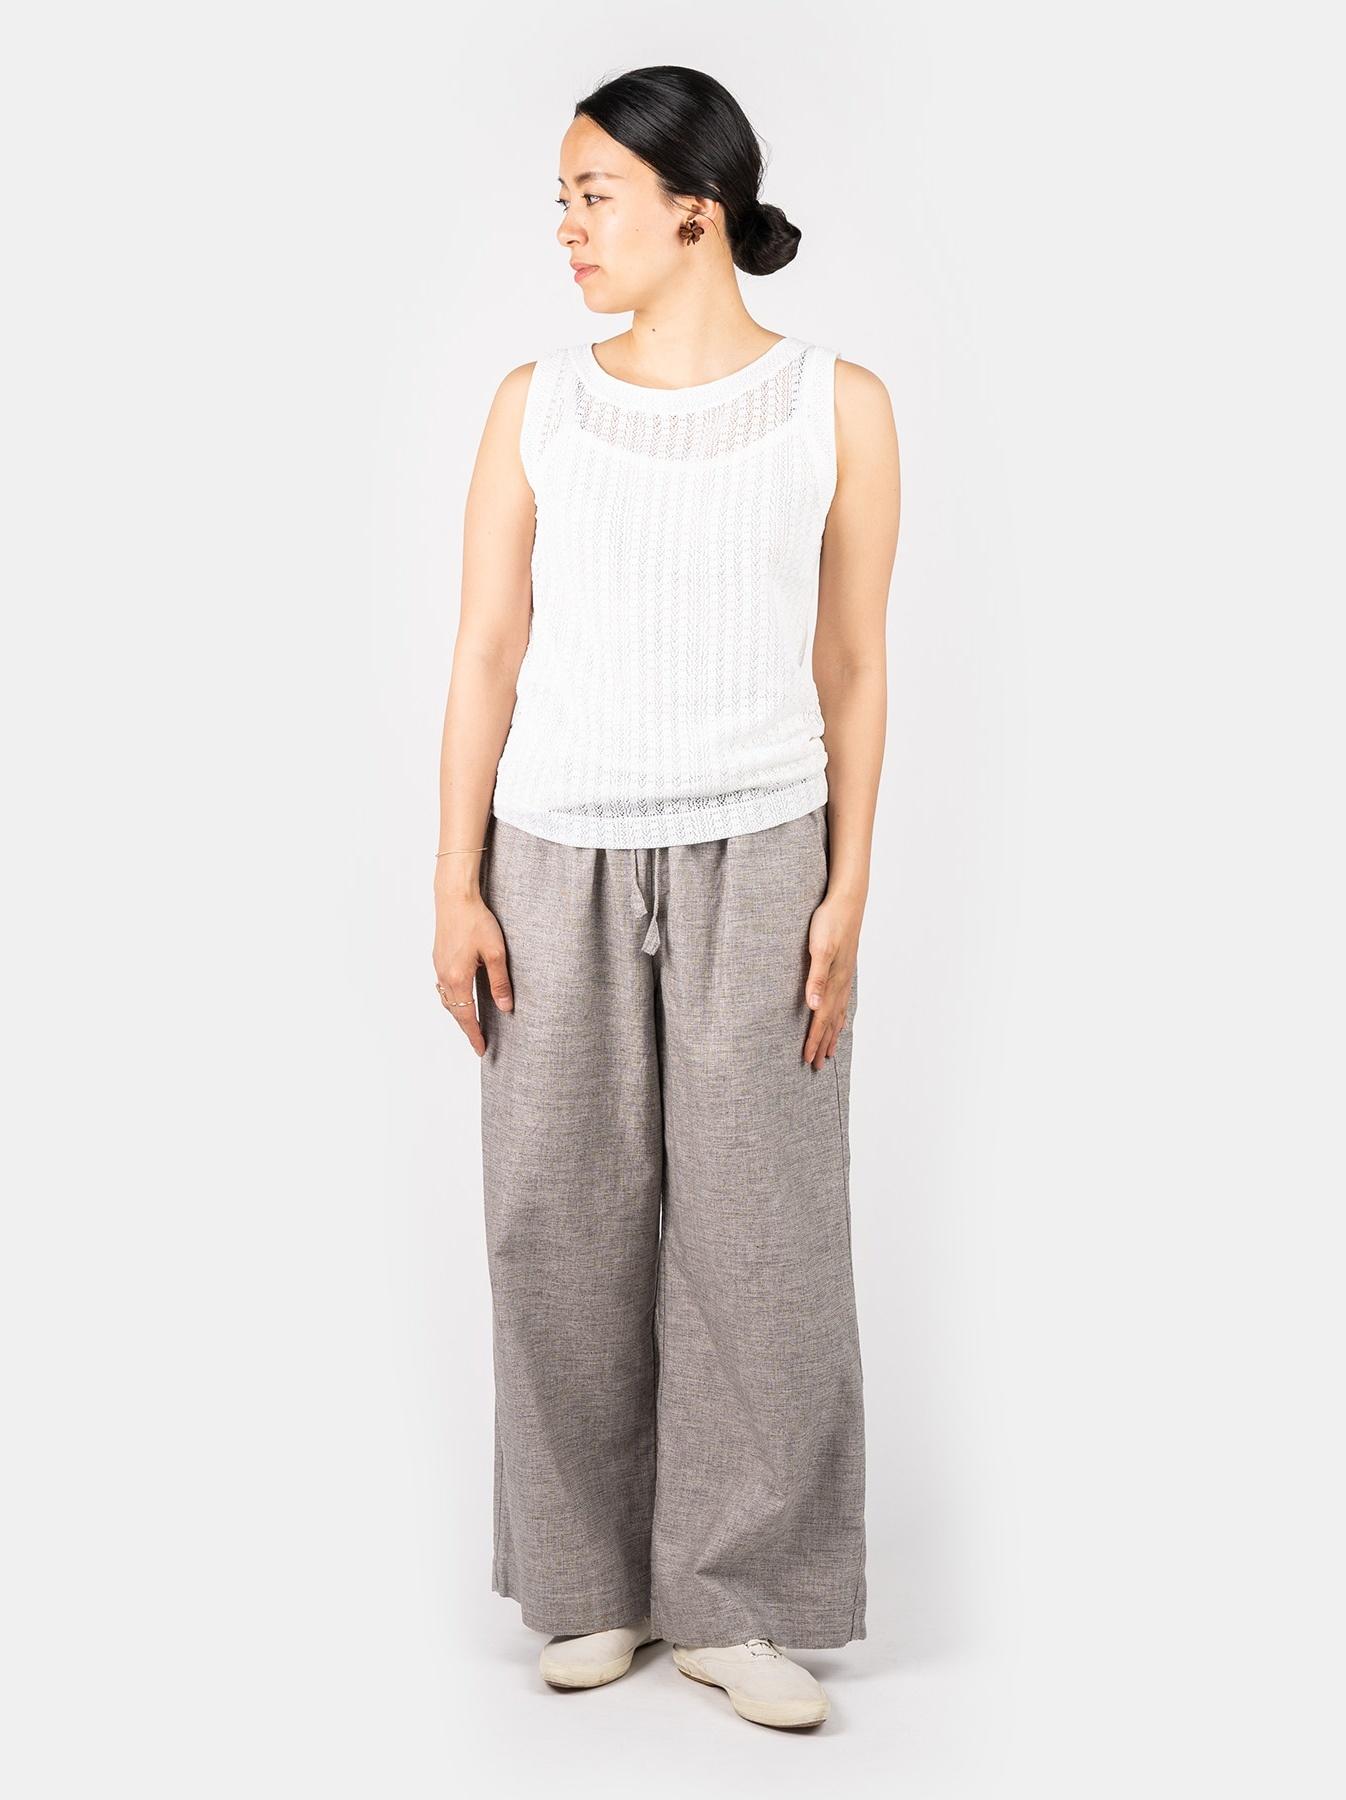 WH Gima Knit Lace Sleeveless Top-2